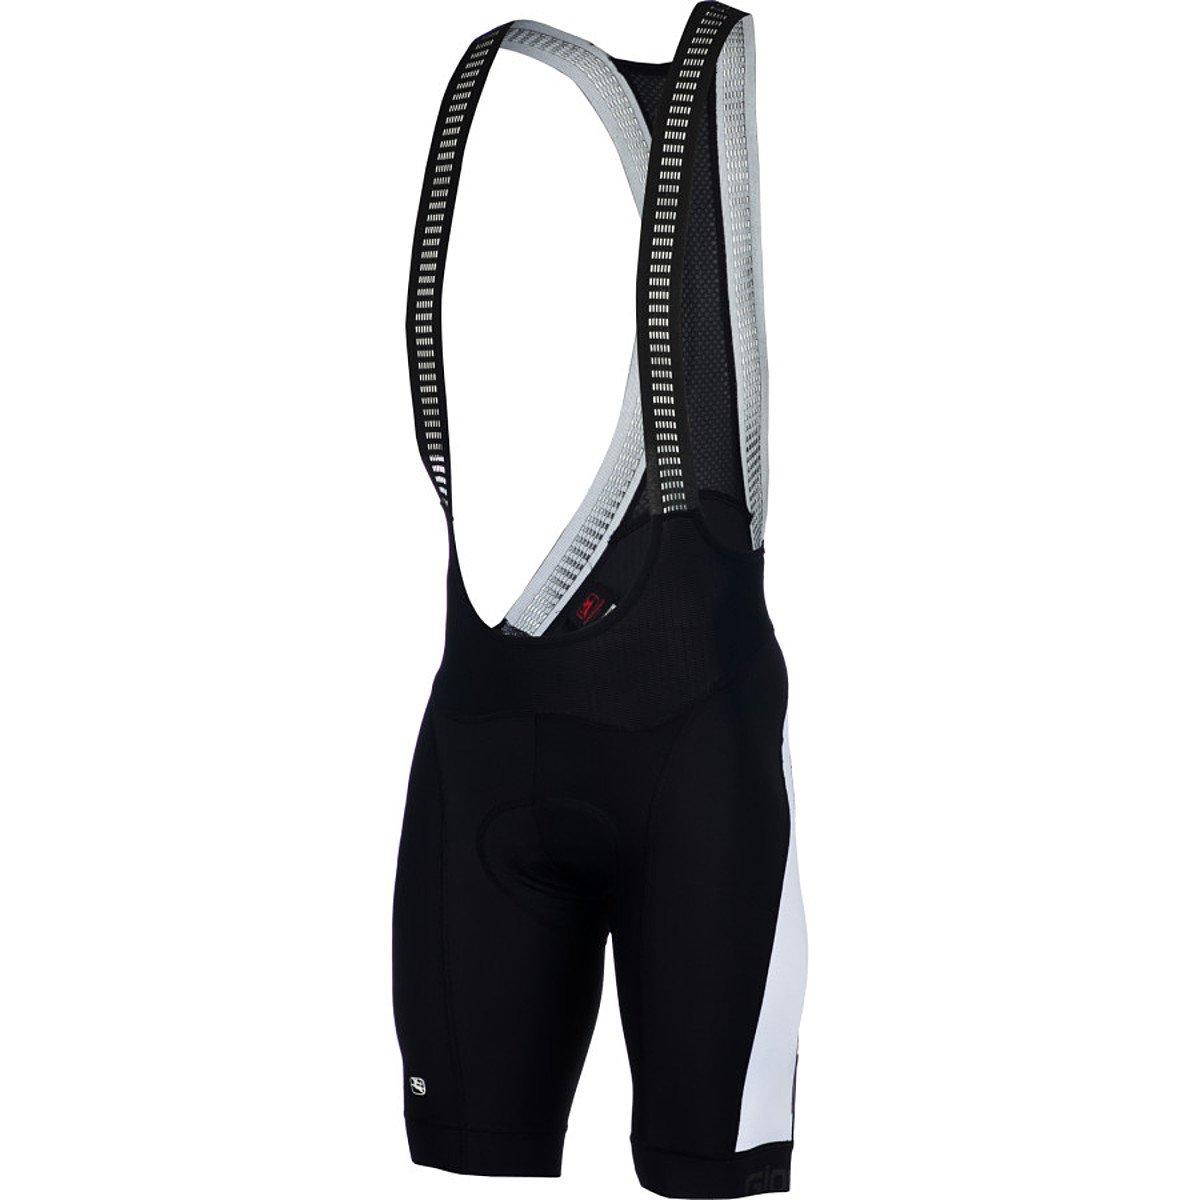 Giordana Laser Men's Compression Bib Shorts - Men's цены онлайн